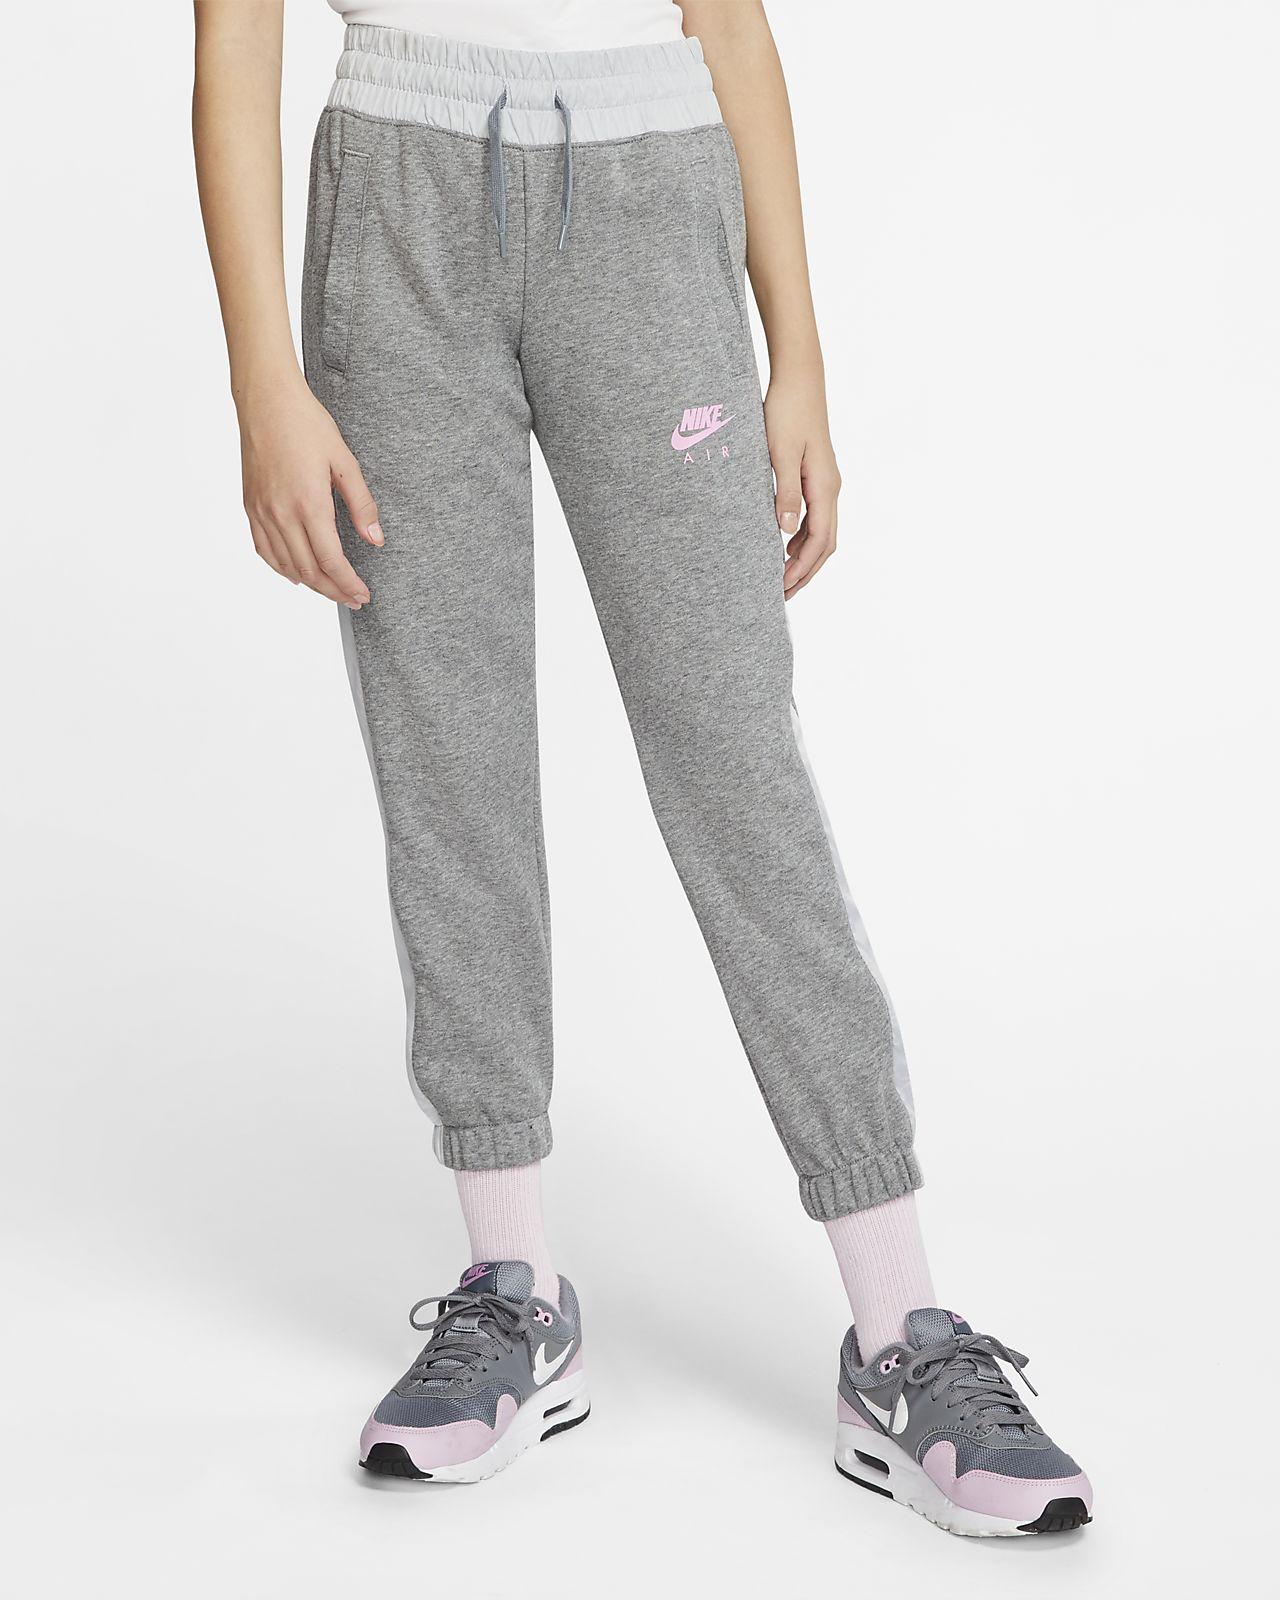 Pantalon Nike Air pour Fille plus âgée